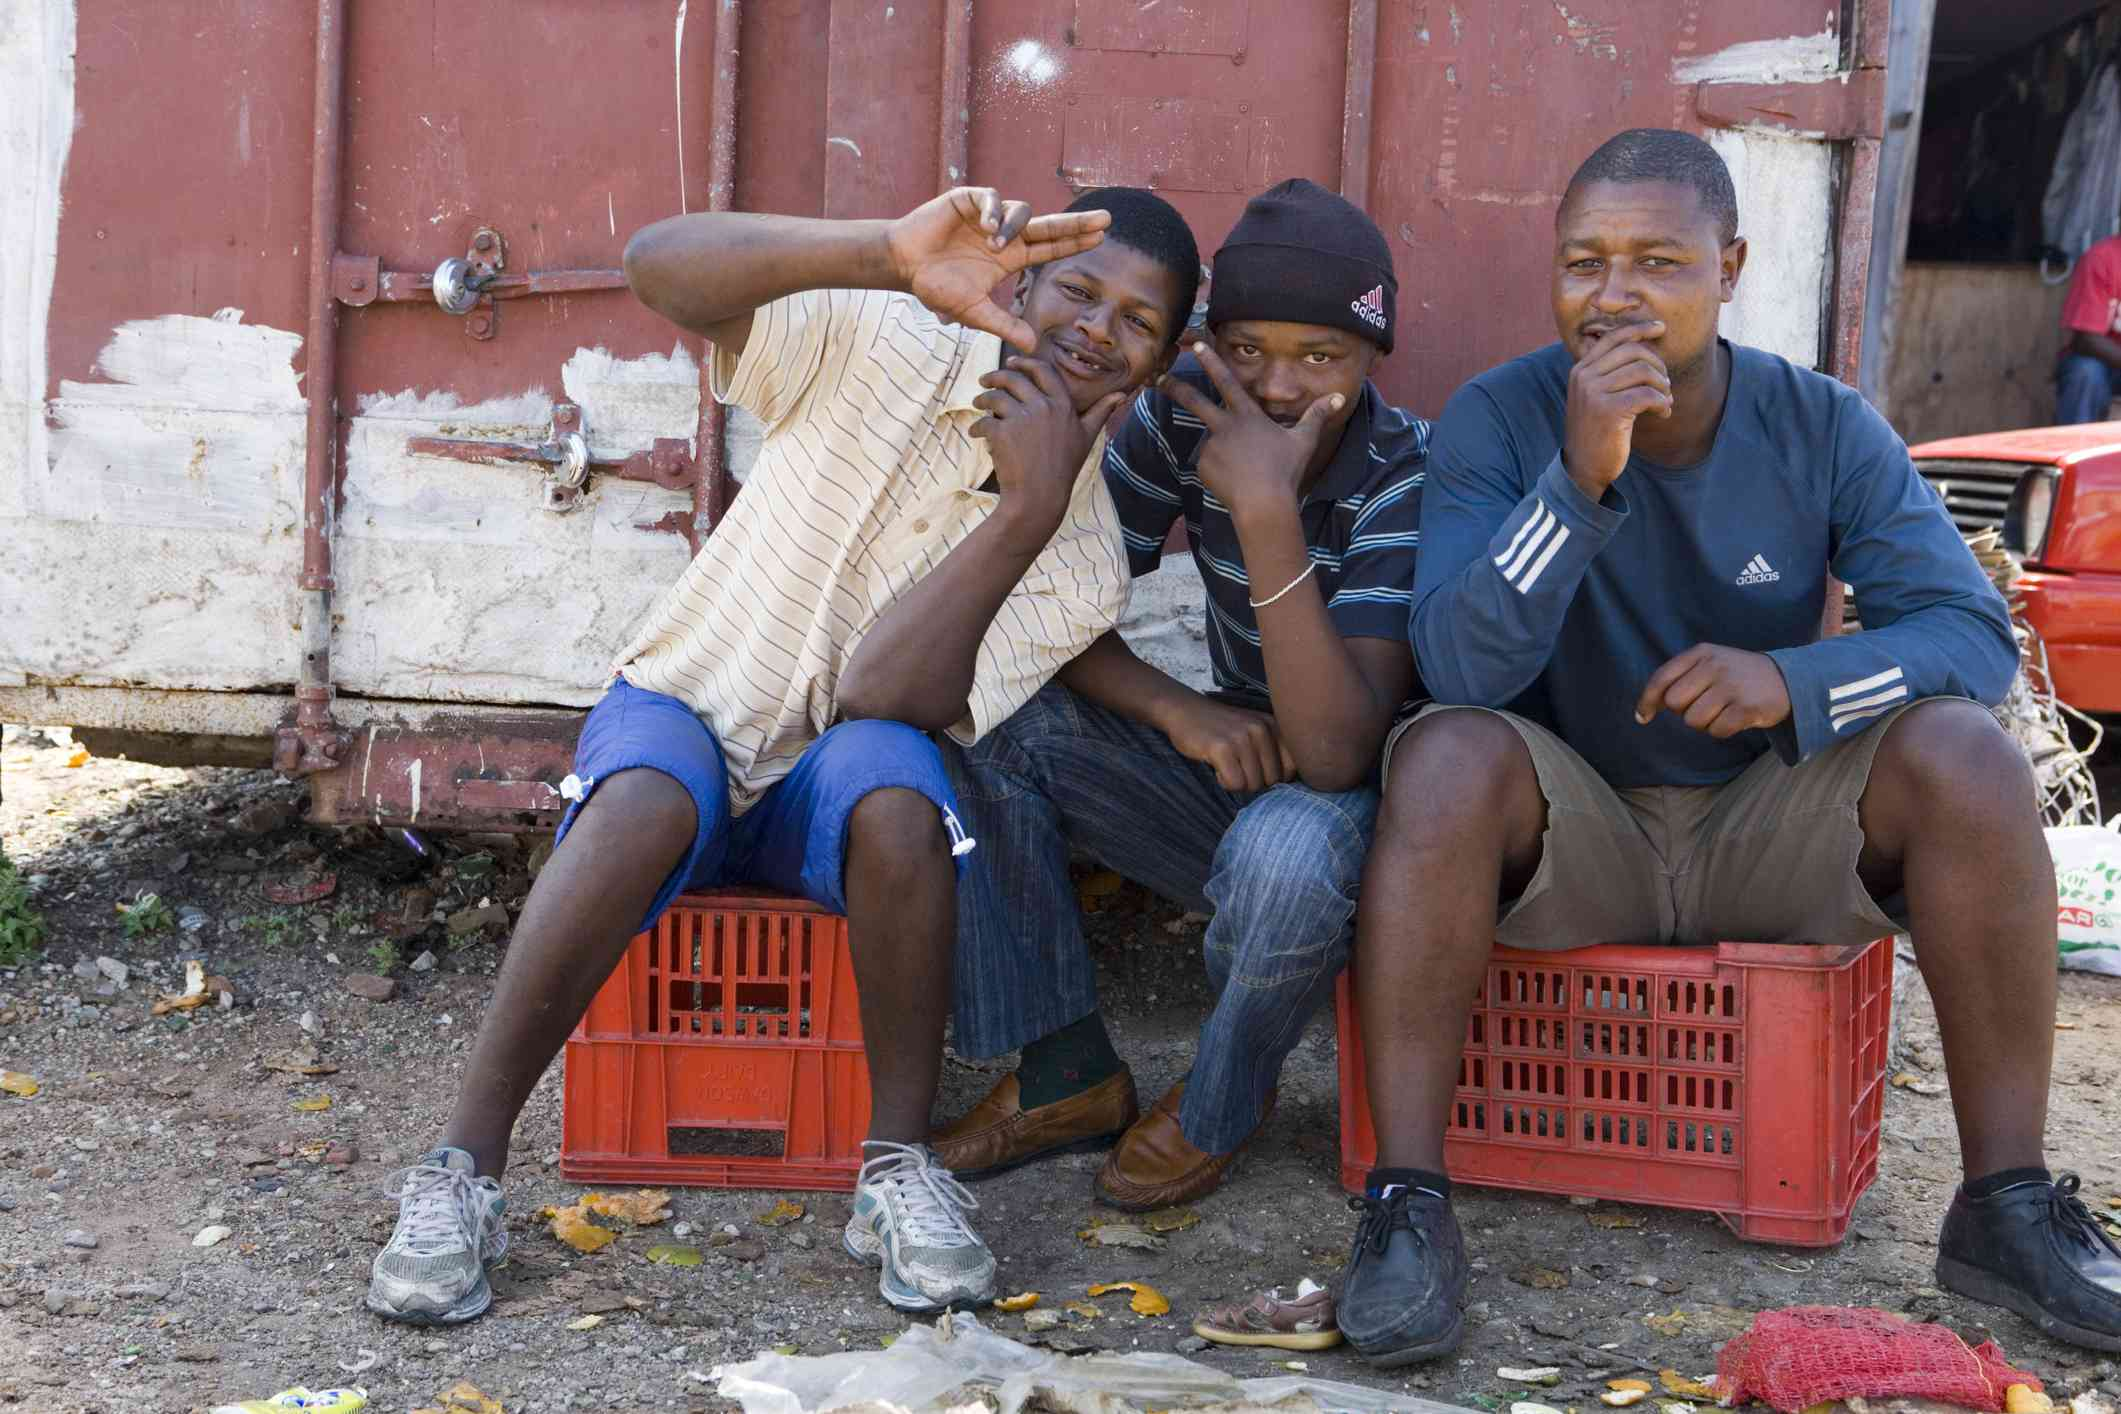 Men in a township, Port Elizabeth